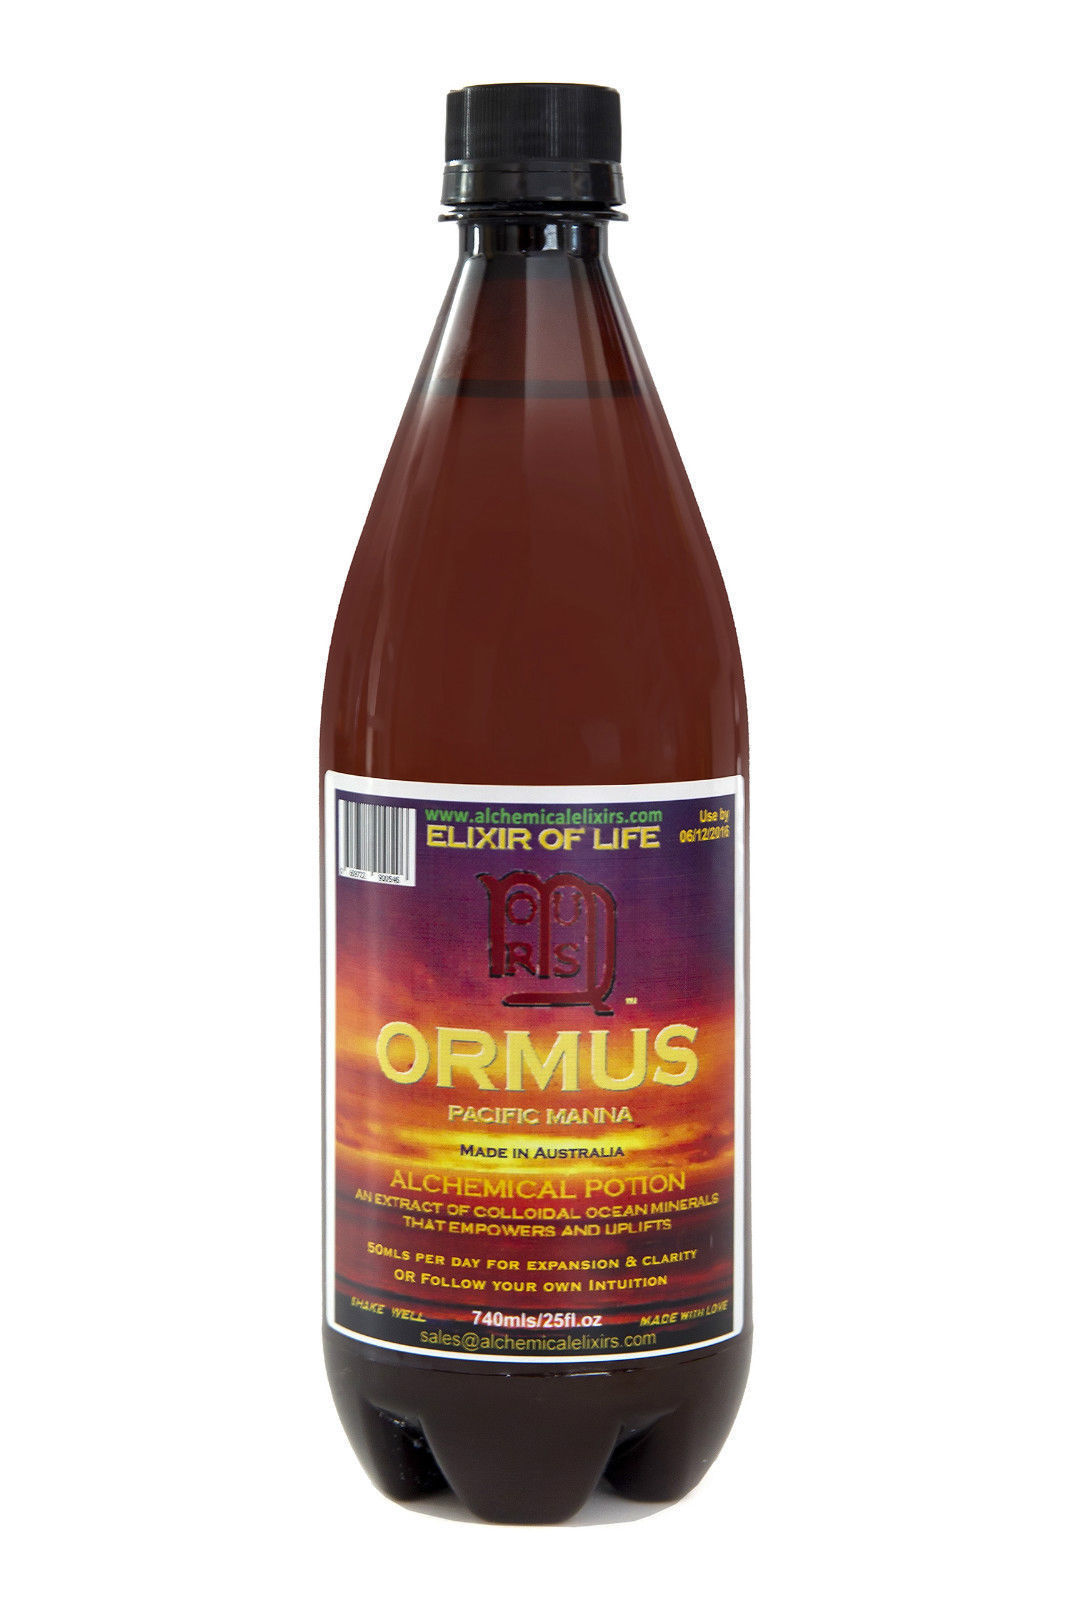 Ormus Gold,Monatomic Gold,Anti-Ageing - $98.00